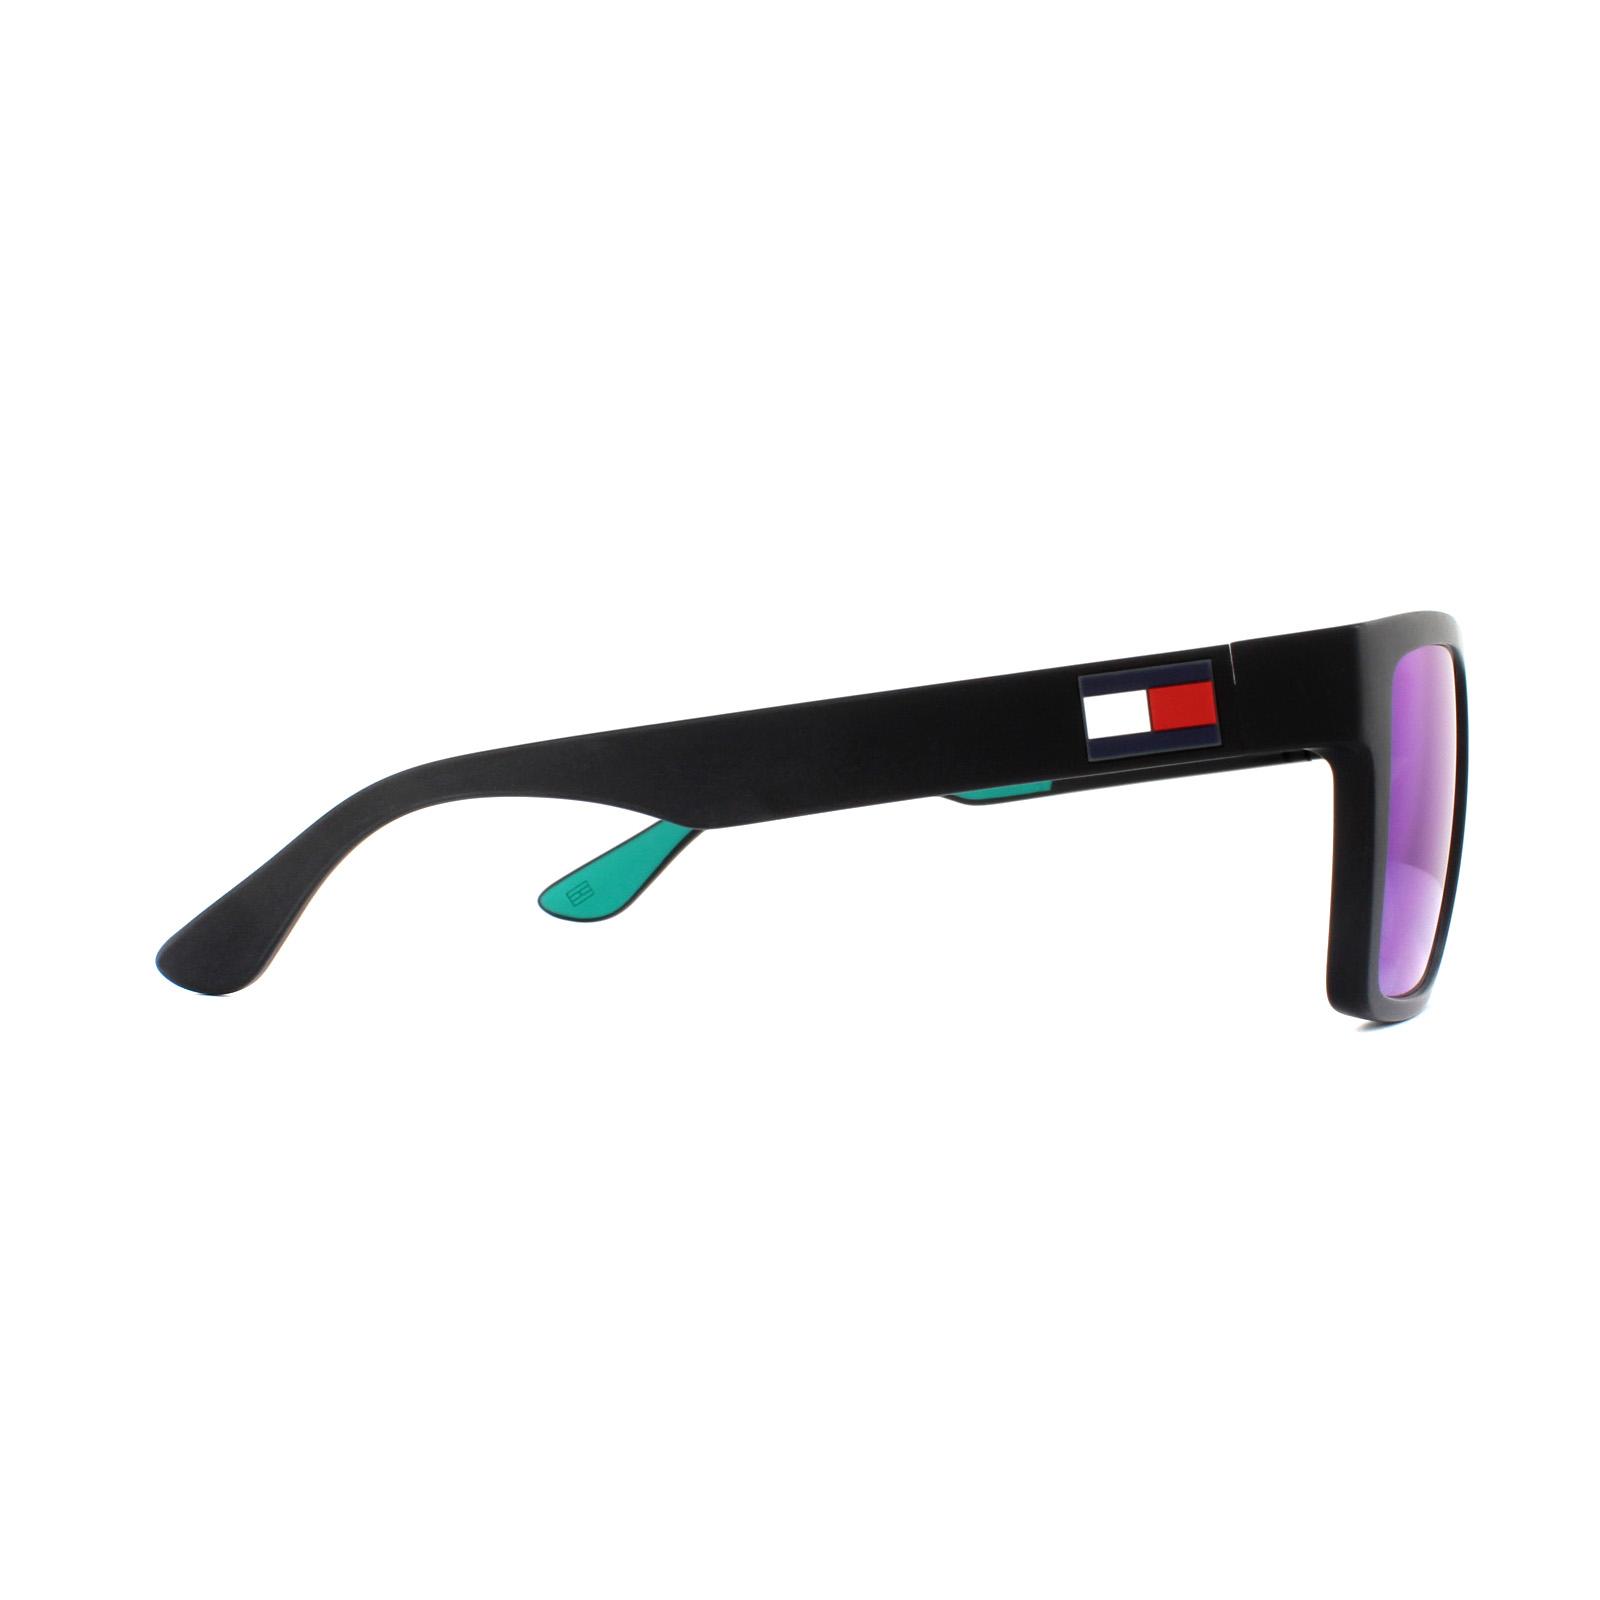 bc6df6690a Sentinel Tommy Hilfiger Sunglasses TH 1605 S 3OL Z9 Black Green Mirror